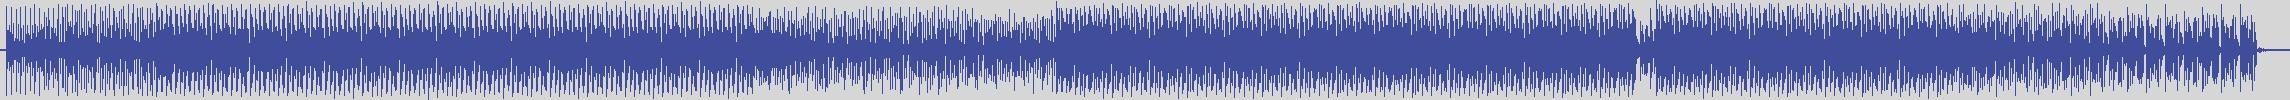 workin [WRK011] Iron Mind - Black Book [Ray Alvarez Mix] audio wave form